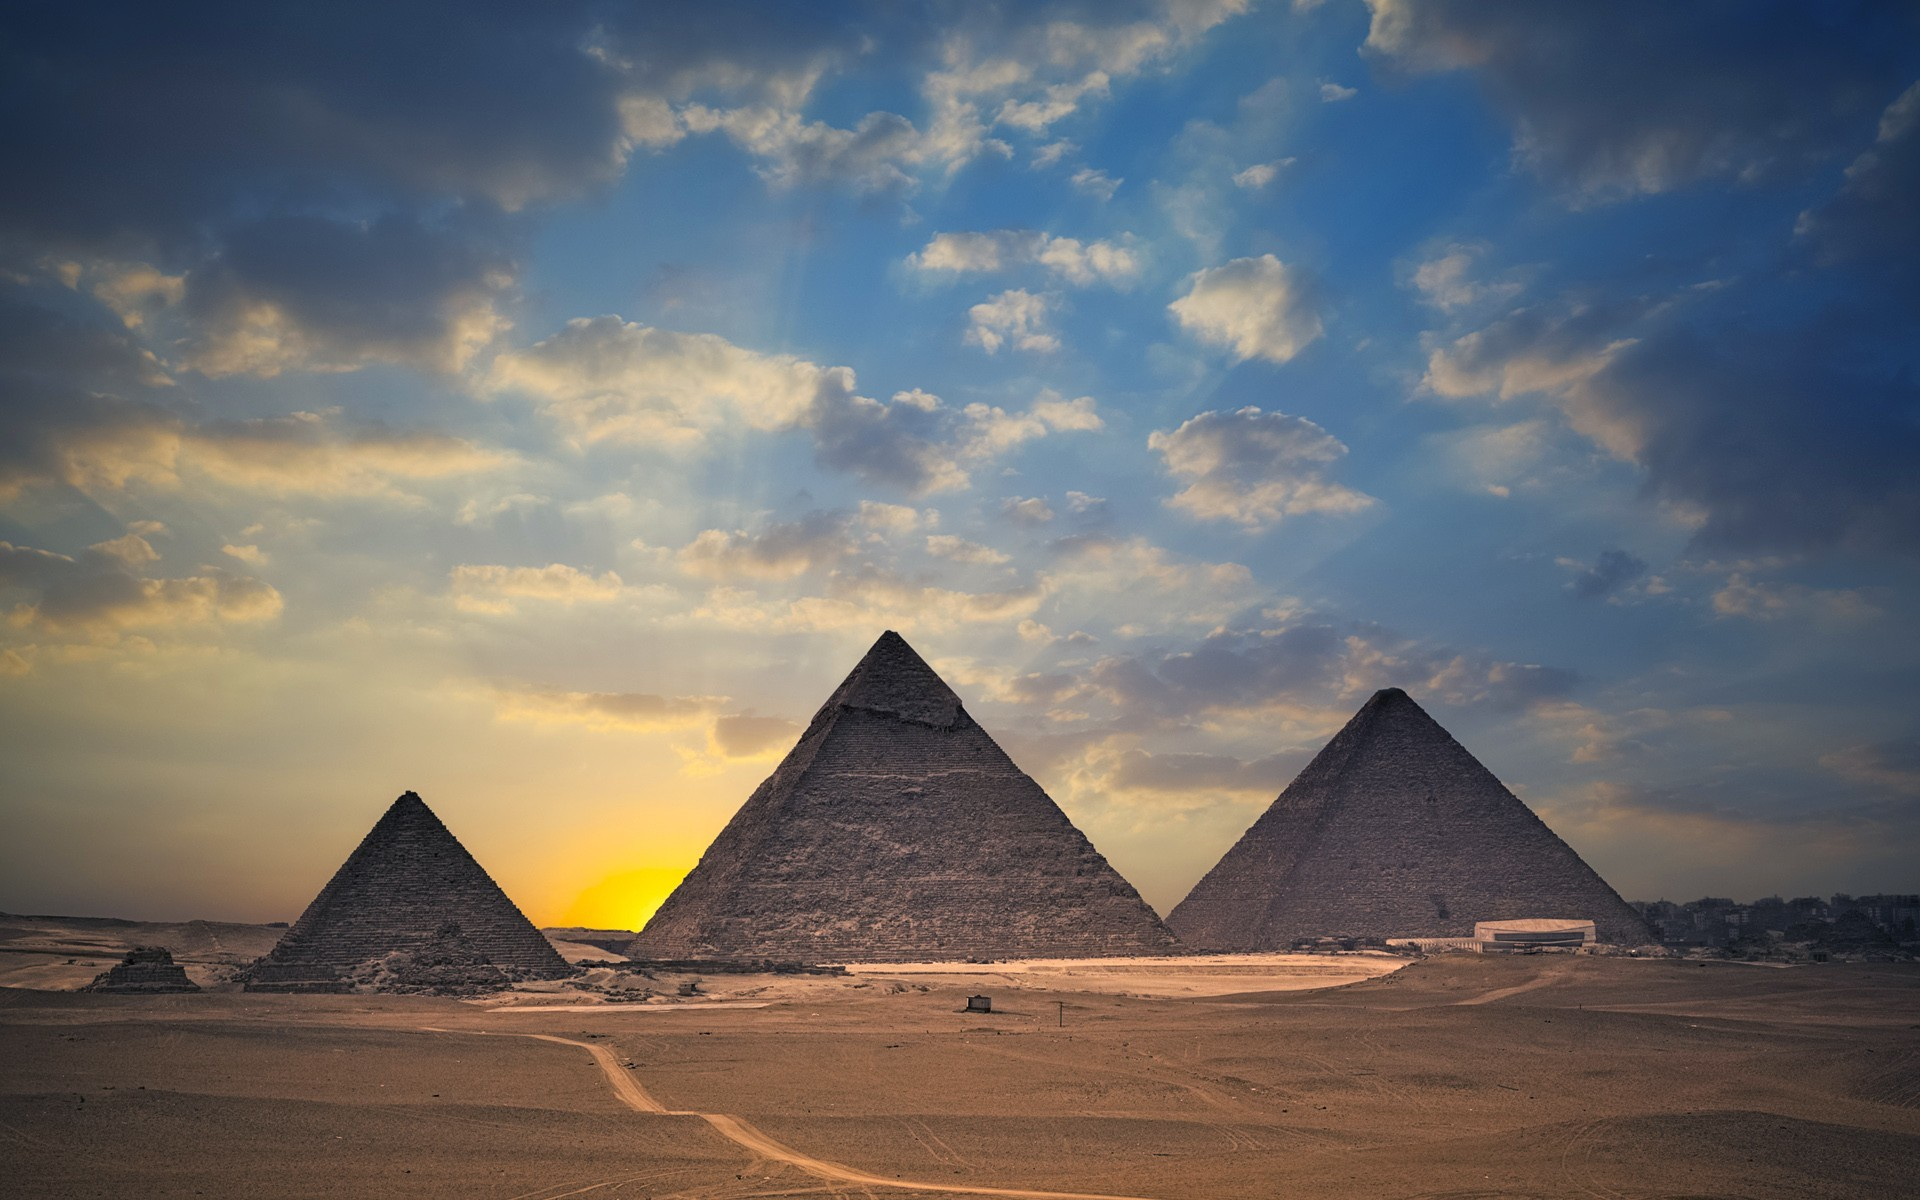 egypt 4k ultra hd wallpaper 0008